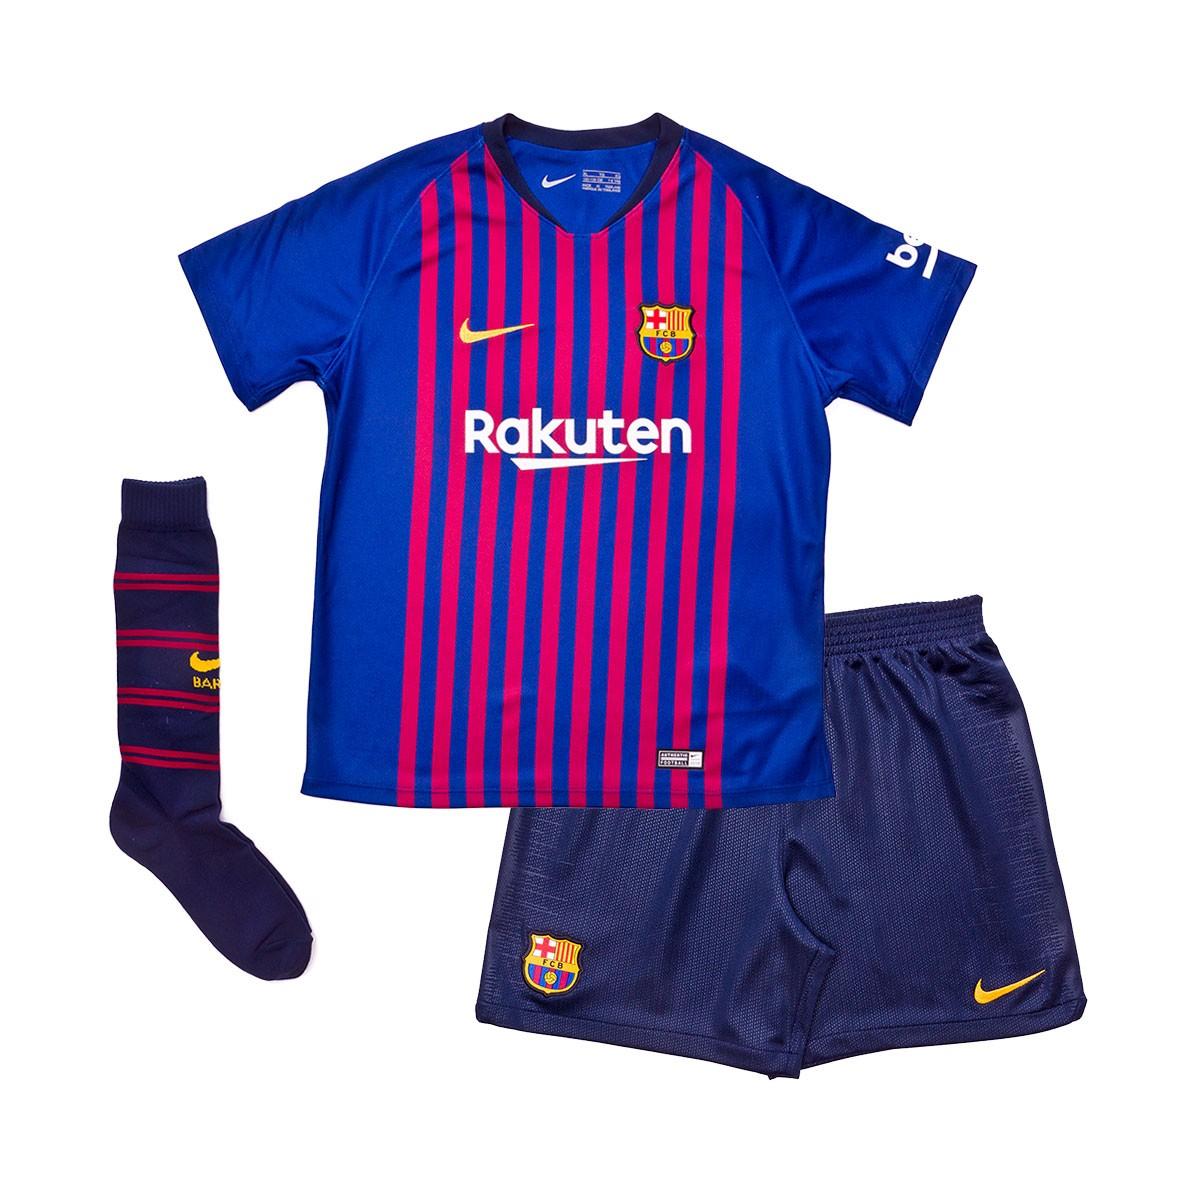 Kit Nike Kids FC Barcelona 2018-2019 Home Deep royal blue-Obsidian ... 63ff738d7d8